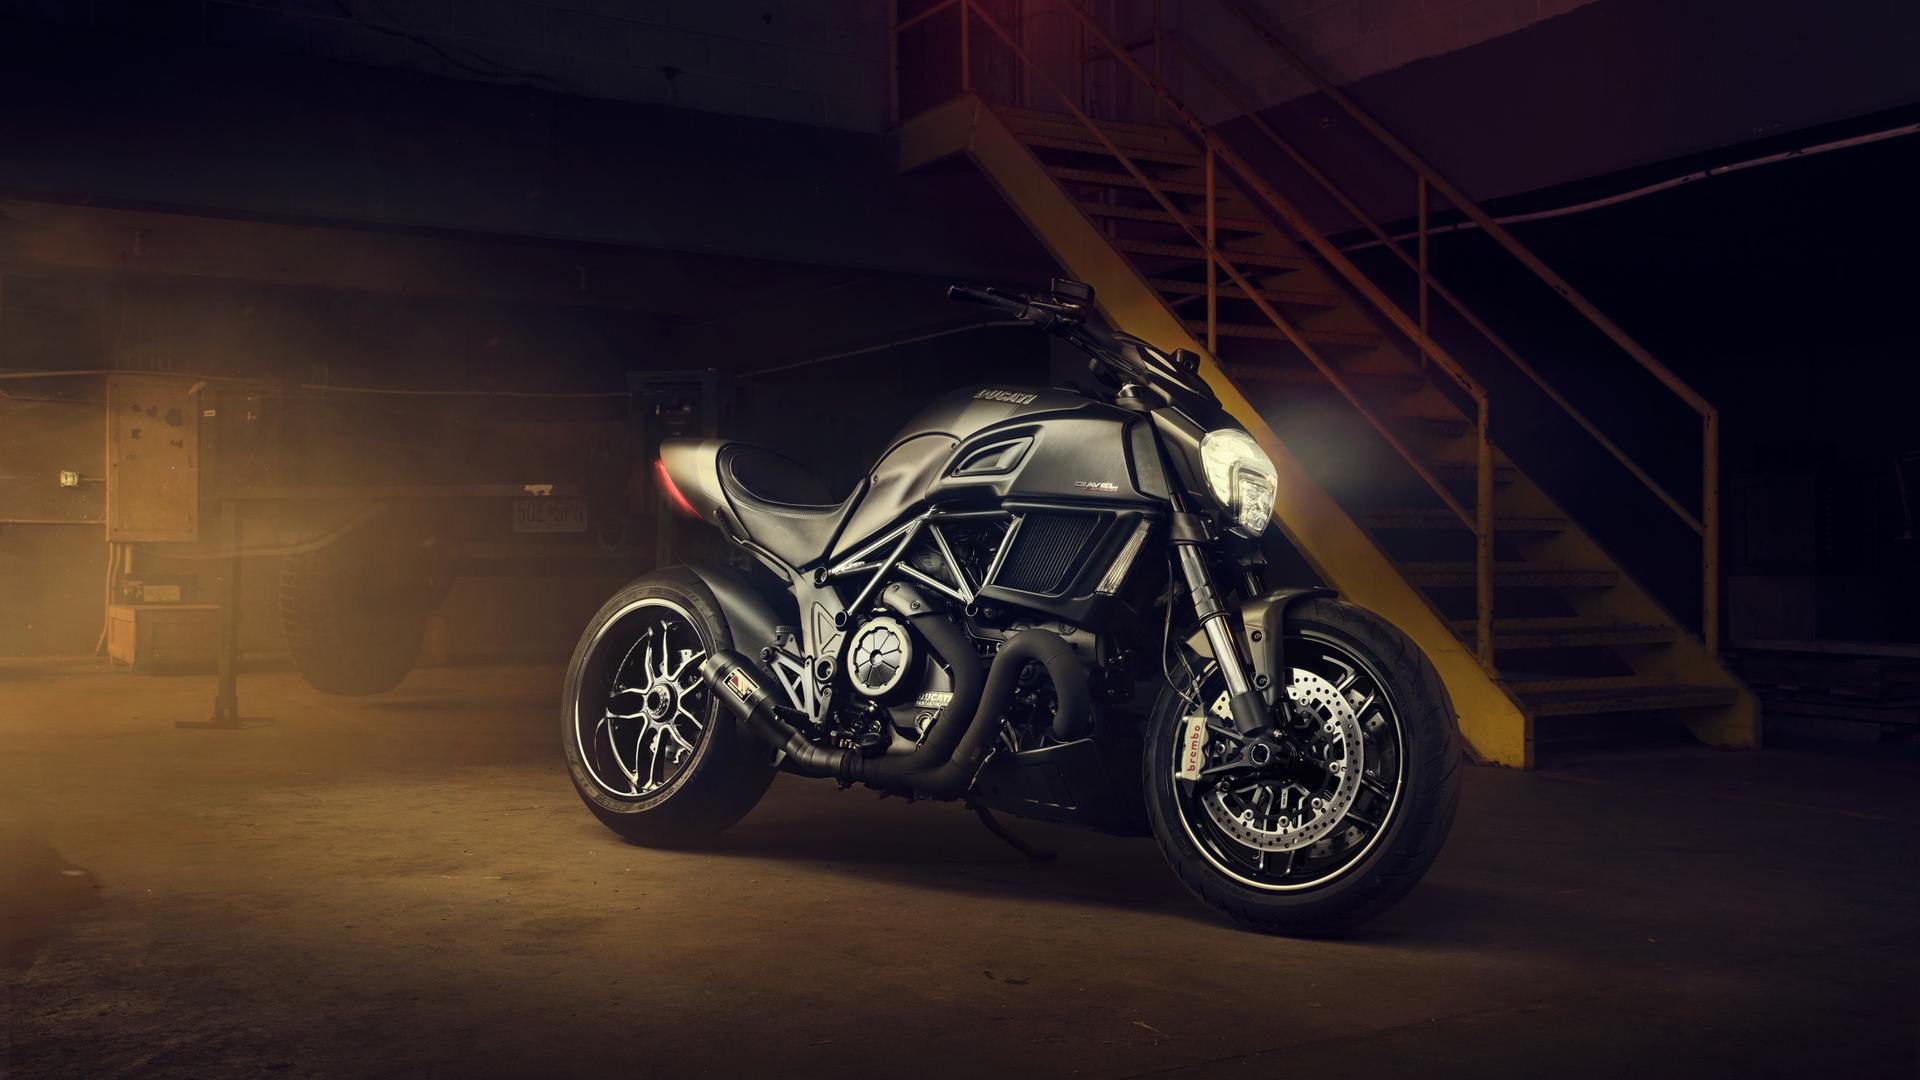 1920x1080 Ducati Diavel Carbon Laptop Full HD 1080P HD 4k